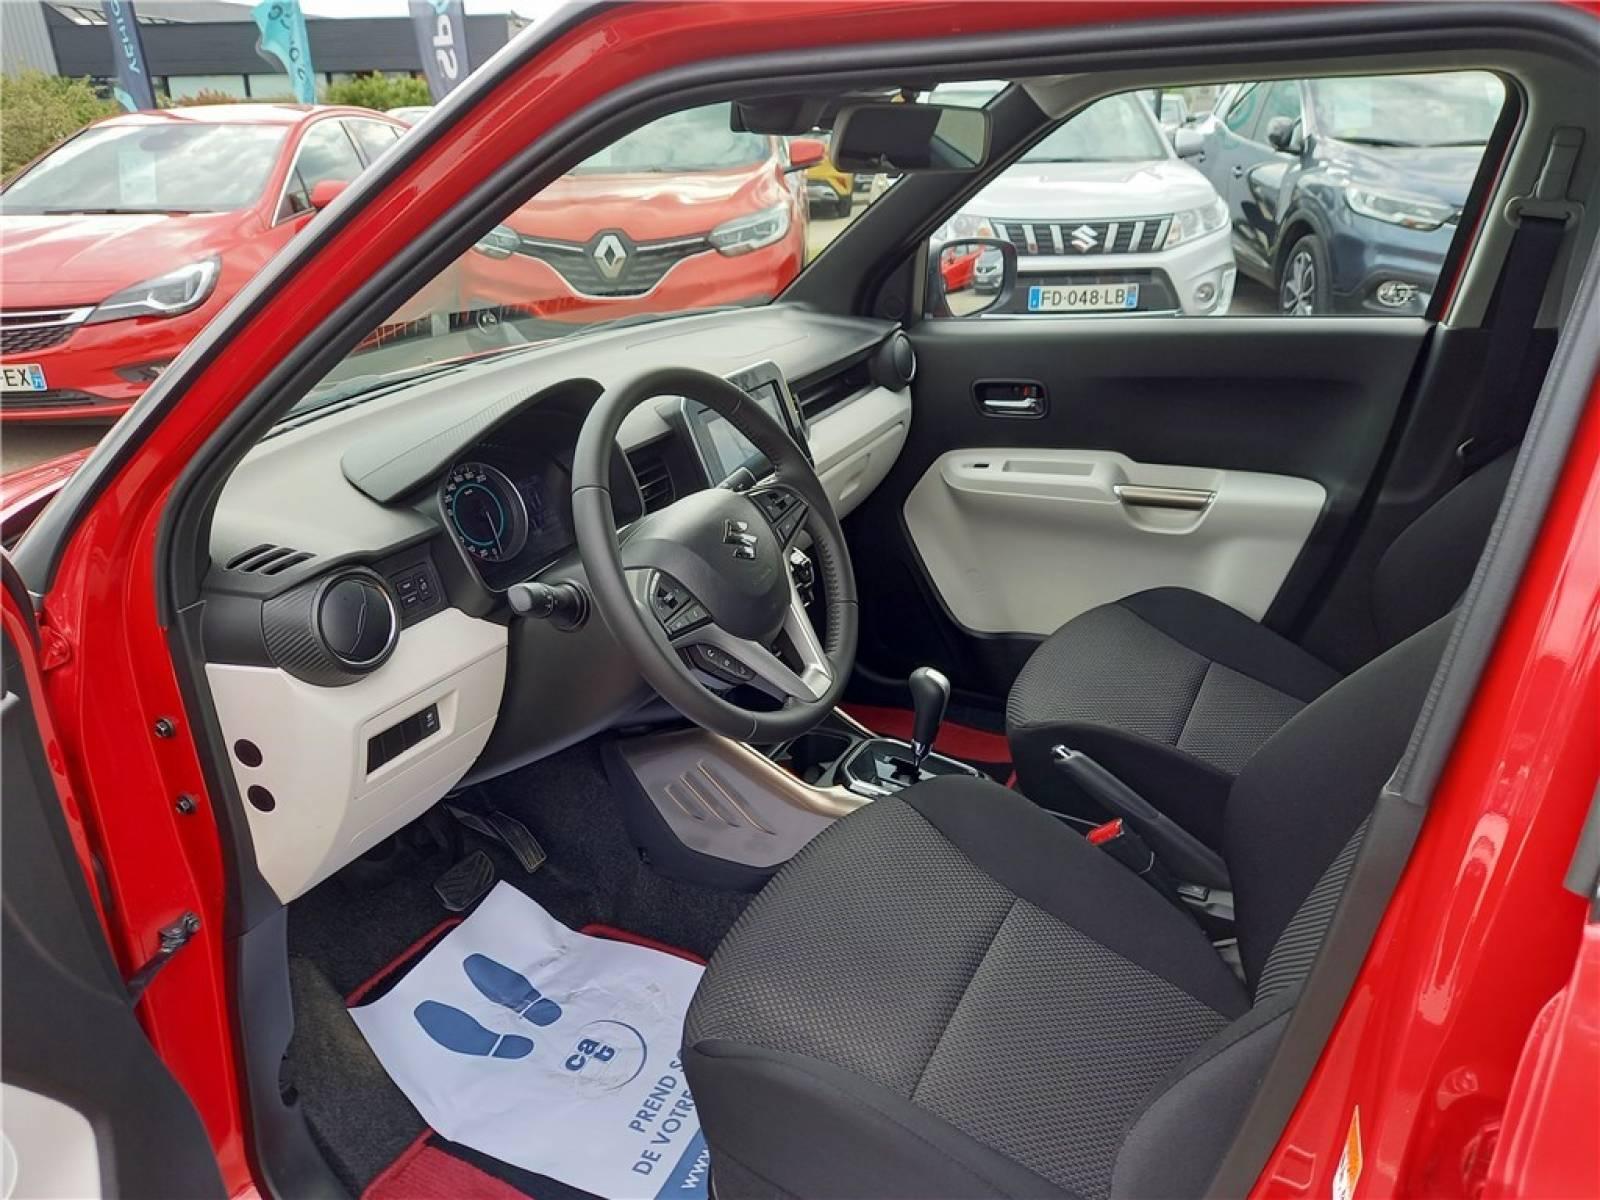 SUZUKI Ignis 1.2 Dualjet Auto (AGS) - véhicule d'occasion - Groupe Guillet - Opel Magicauto - Chalon-sur-Saône - 71380 - Saint-Marcel - 20